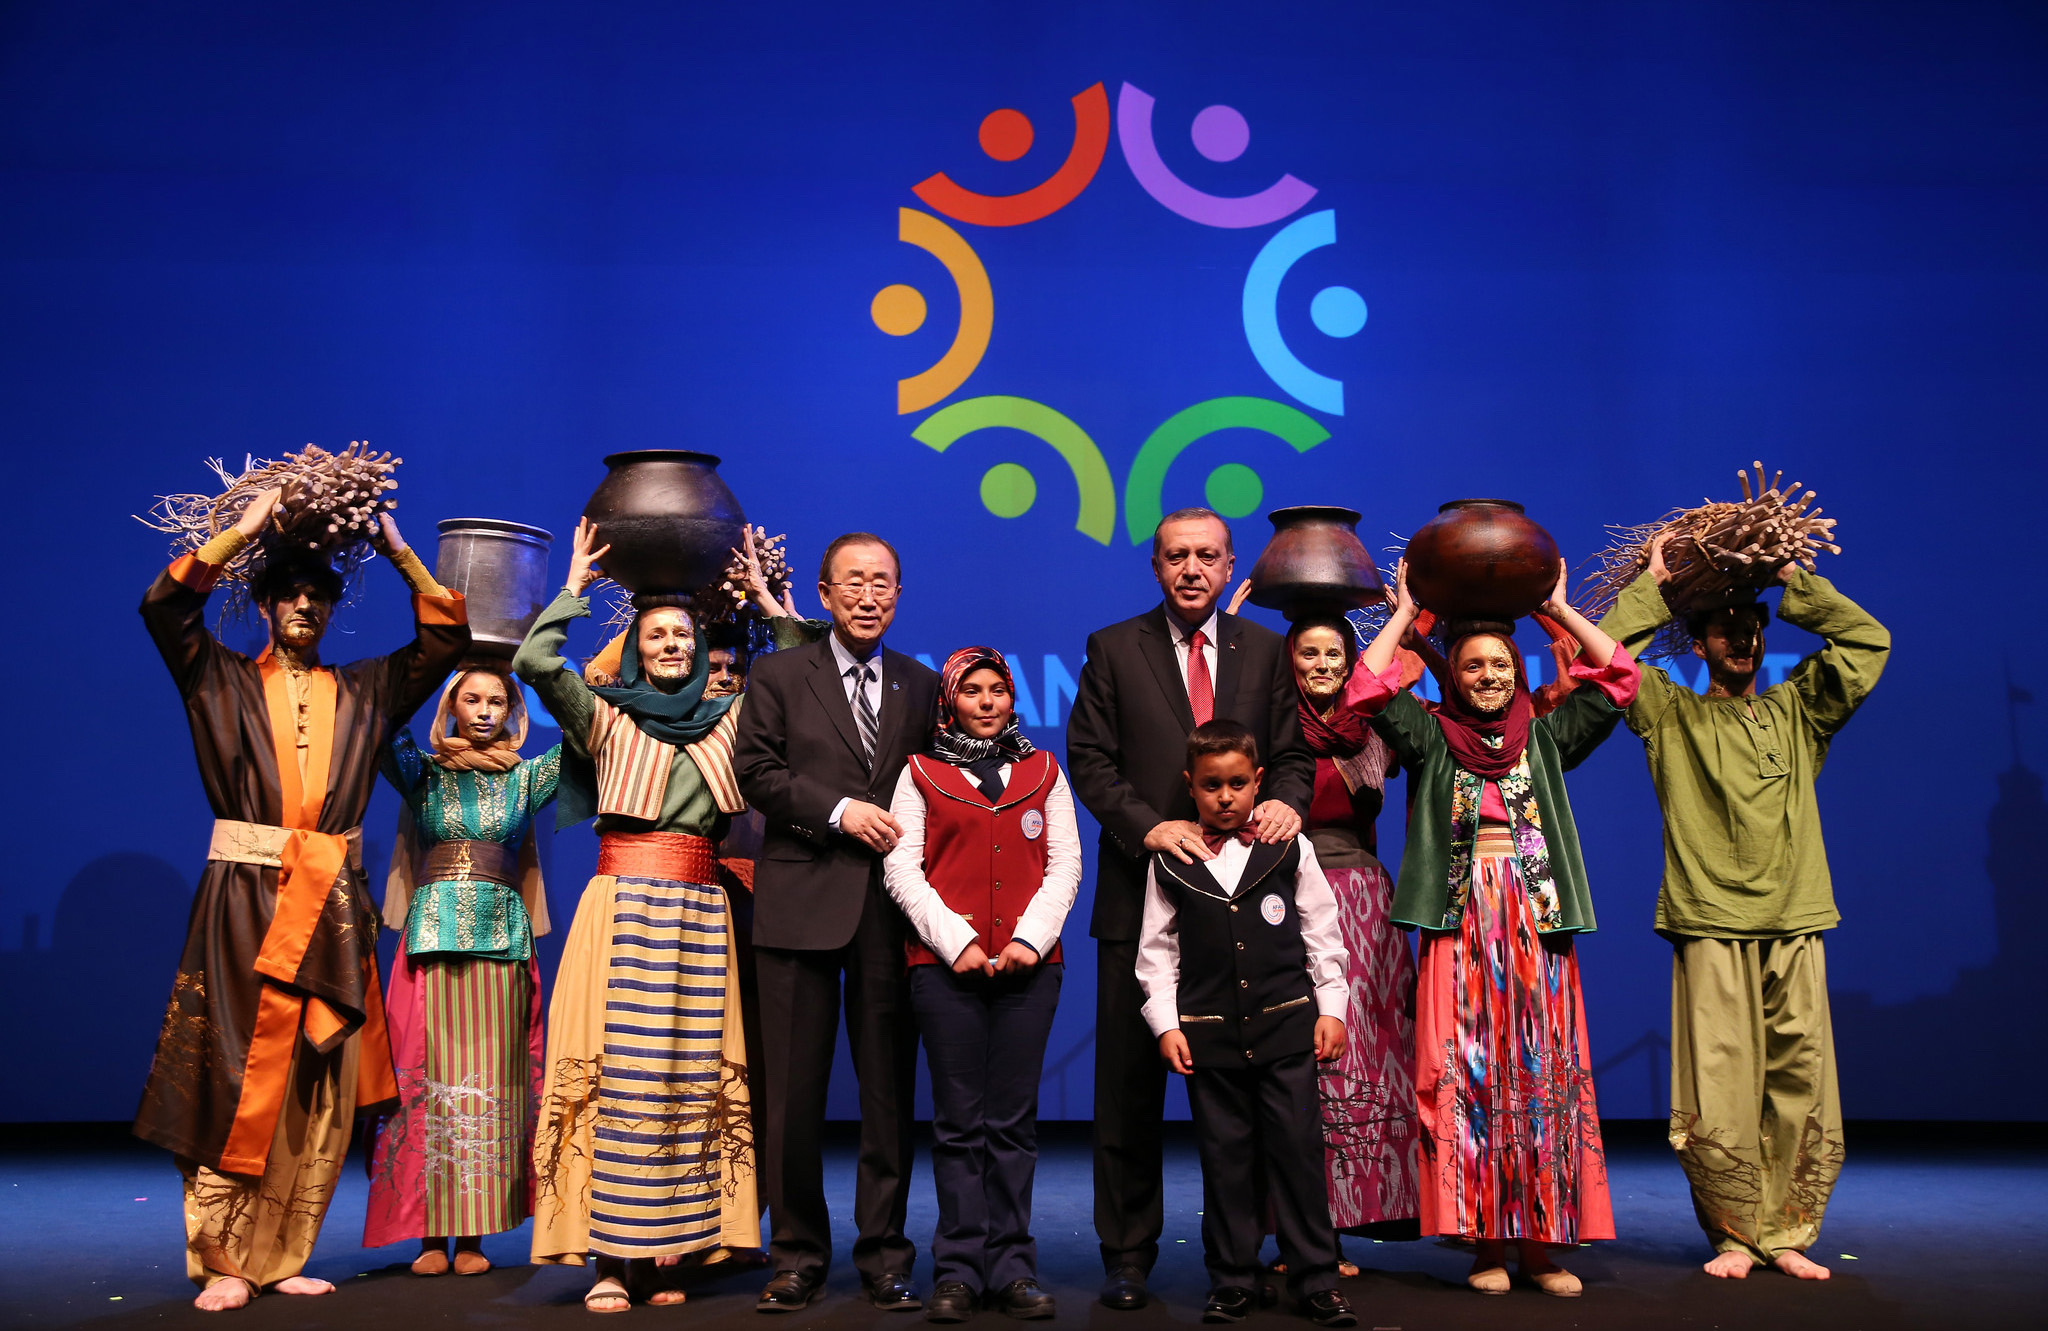 Closing ceremony with Ban Ki Moon